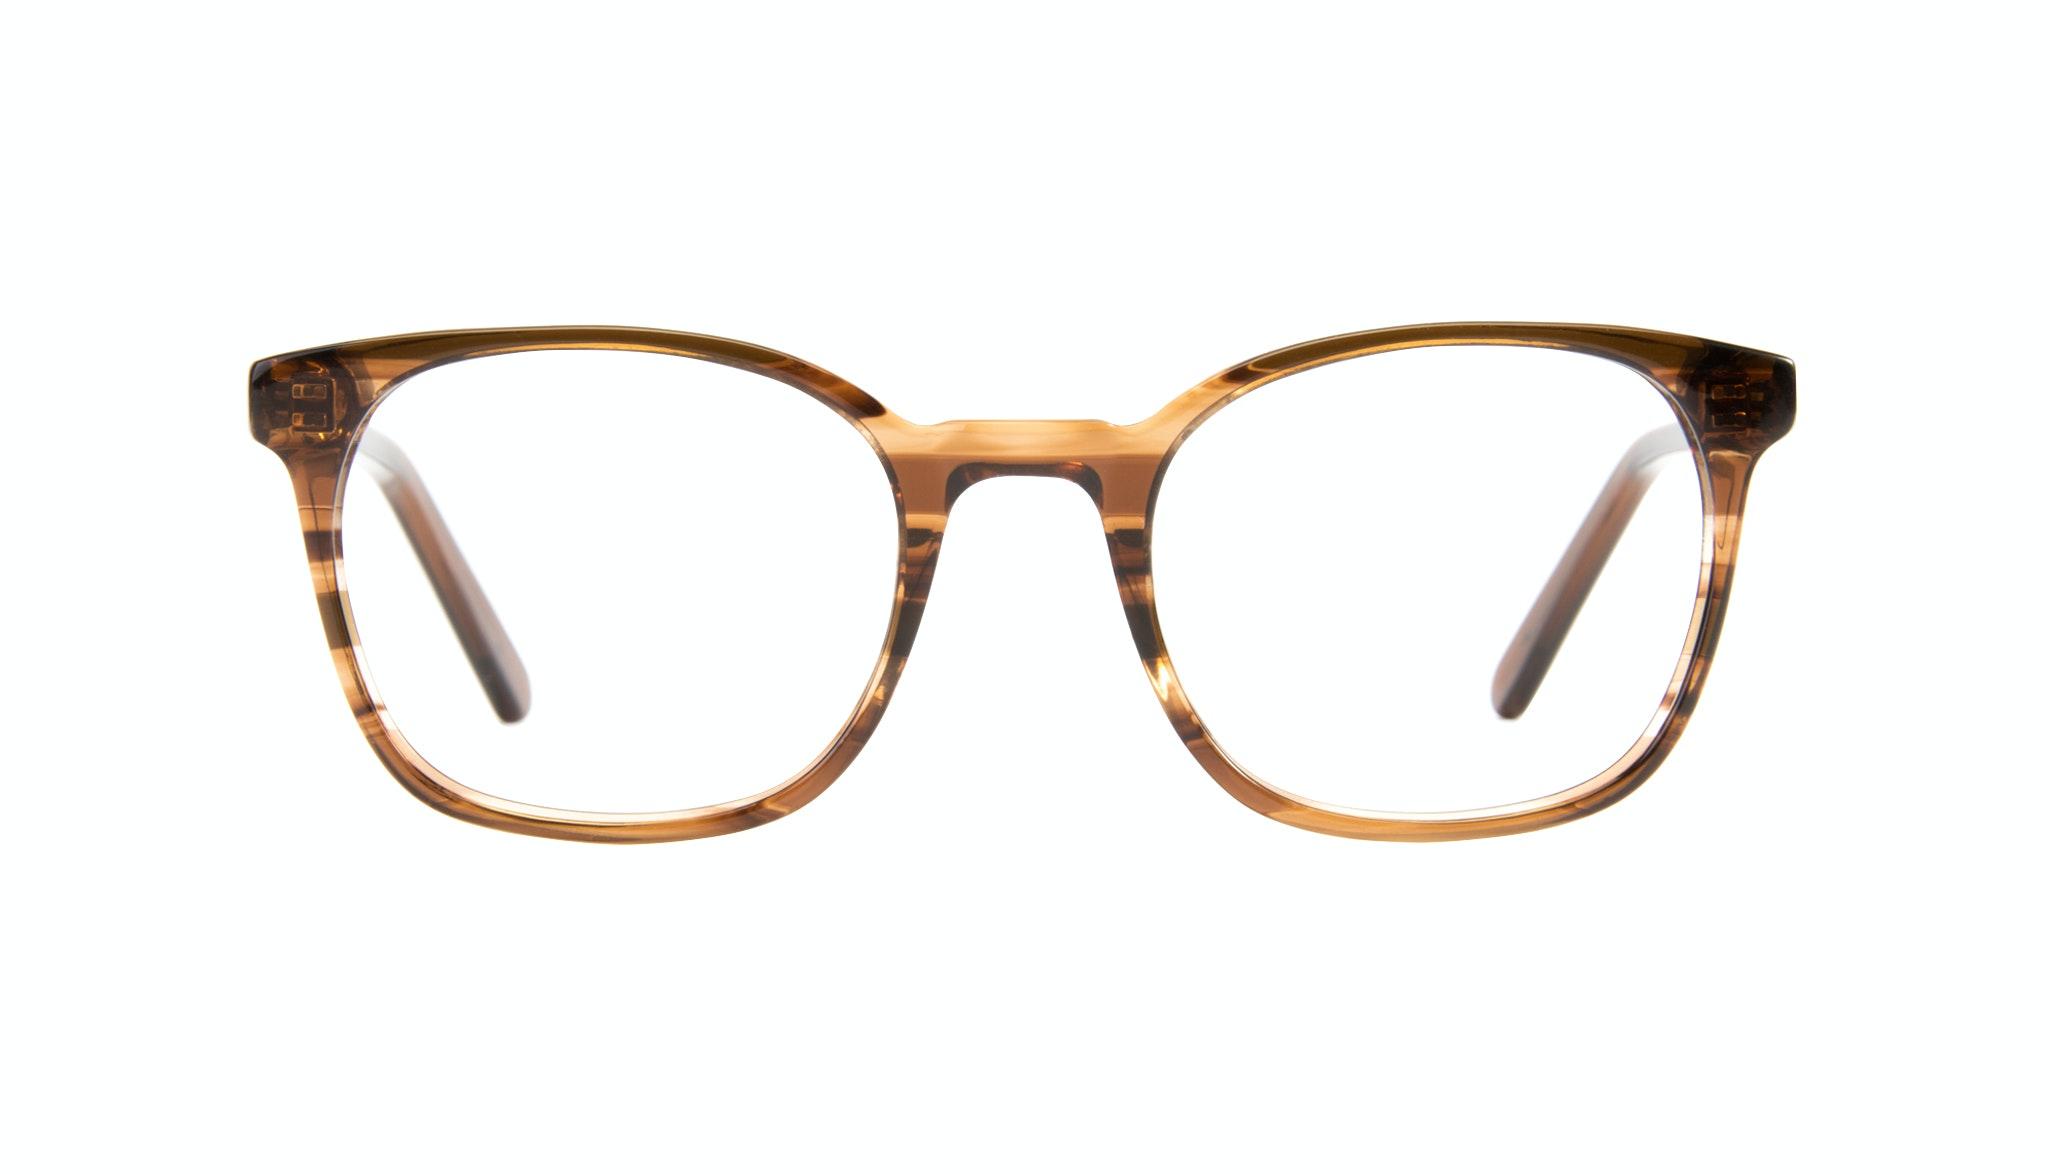 Affordable Fashion Glasses Rectangle Square Eyeglasses Men Peak Wood